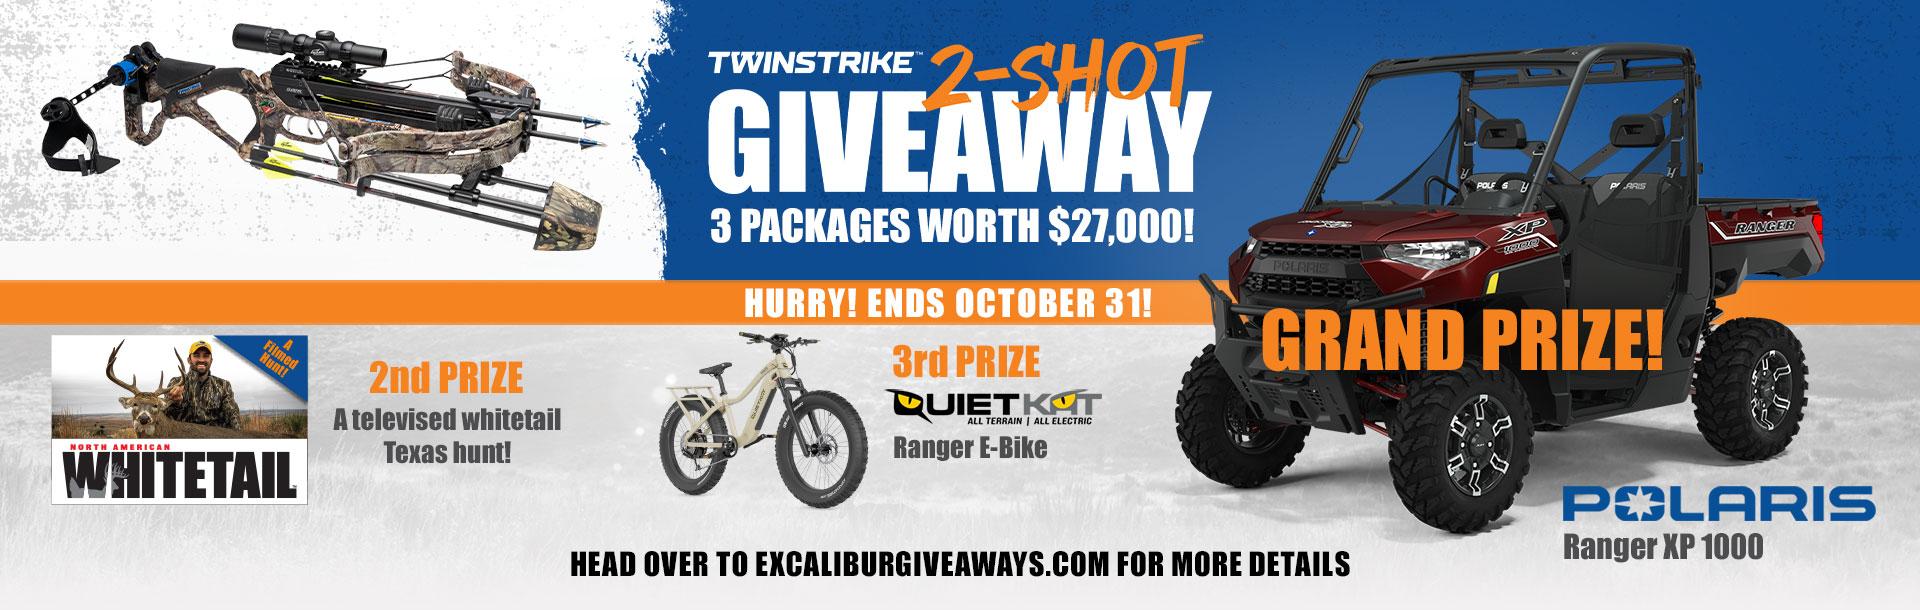 TwinStrike 2-Shot Giveaway